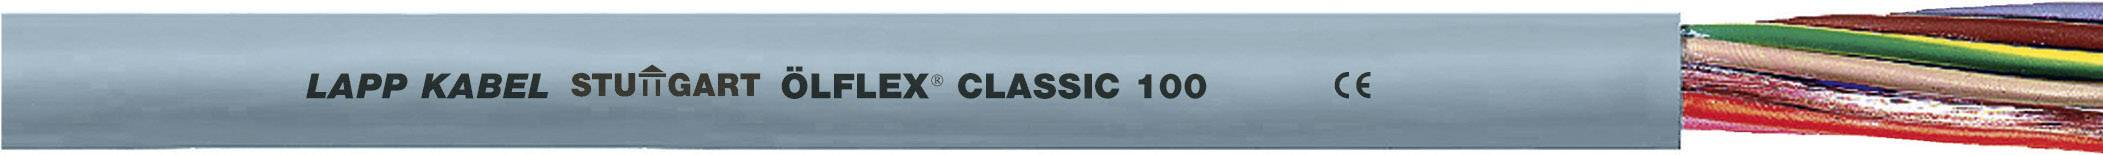 Kabel LappKabel Ölflex CLASSIC 100 4G185 (00103123), PVC, 62,8 mm, 750 V, šedá, 100 m